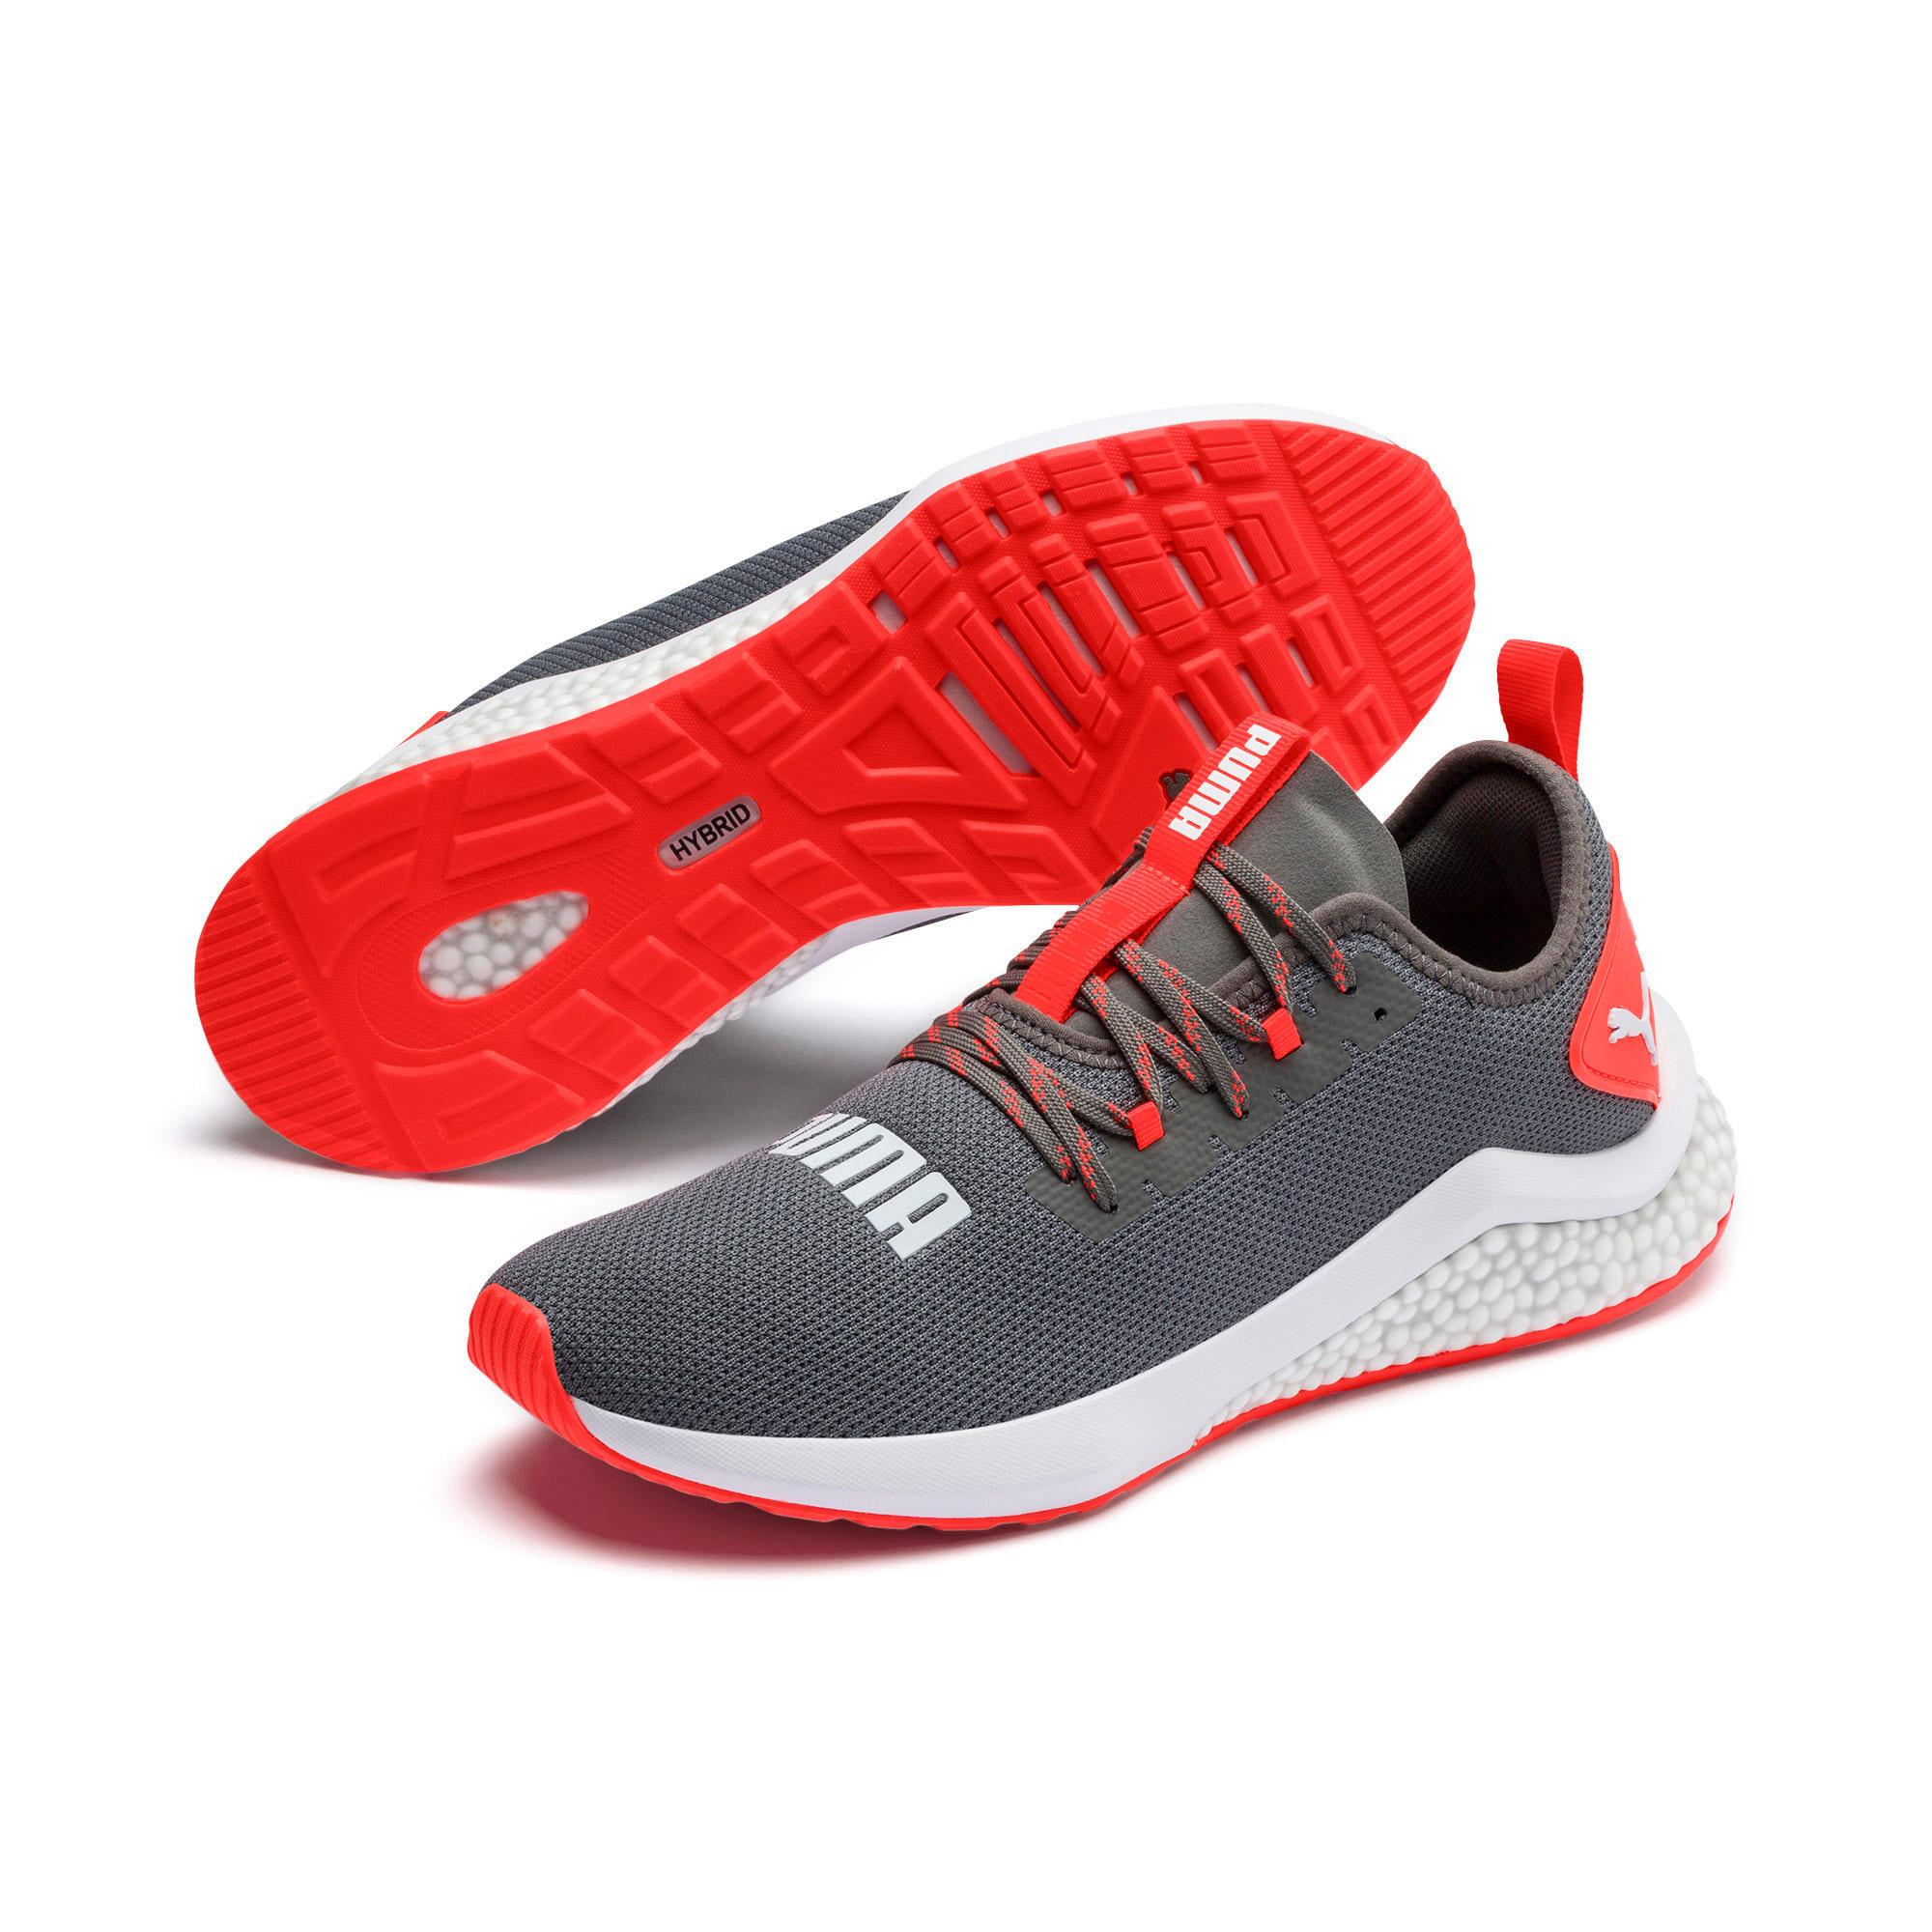 Thumbnail 3 of HYBRID NX Men's Running Shoes, CASTLEROCK-Nrgy Red, medium